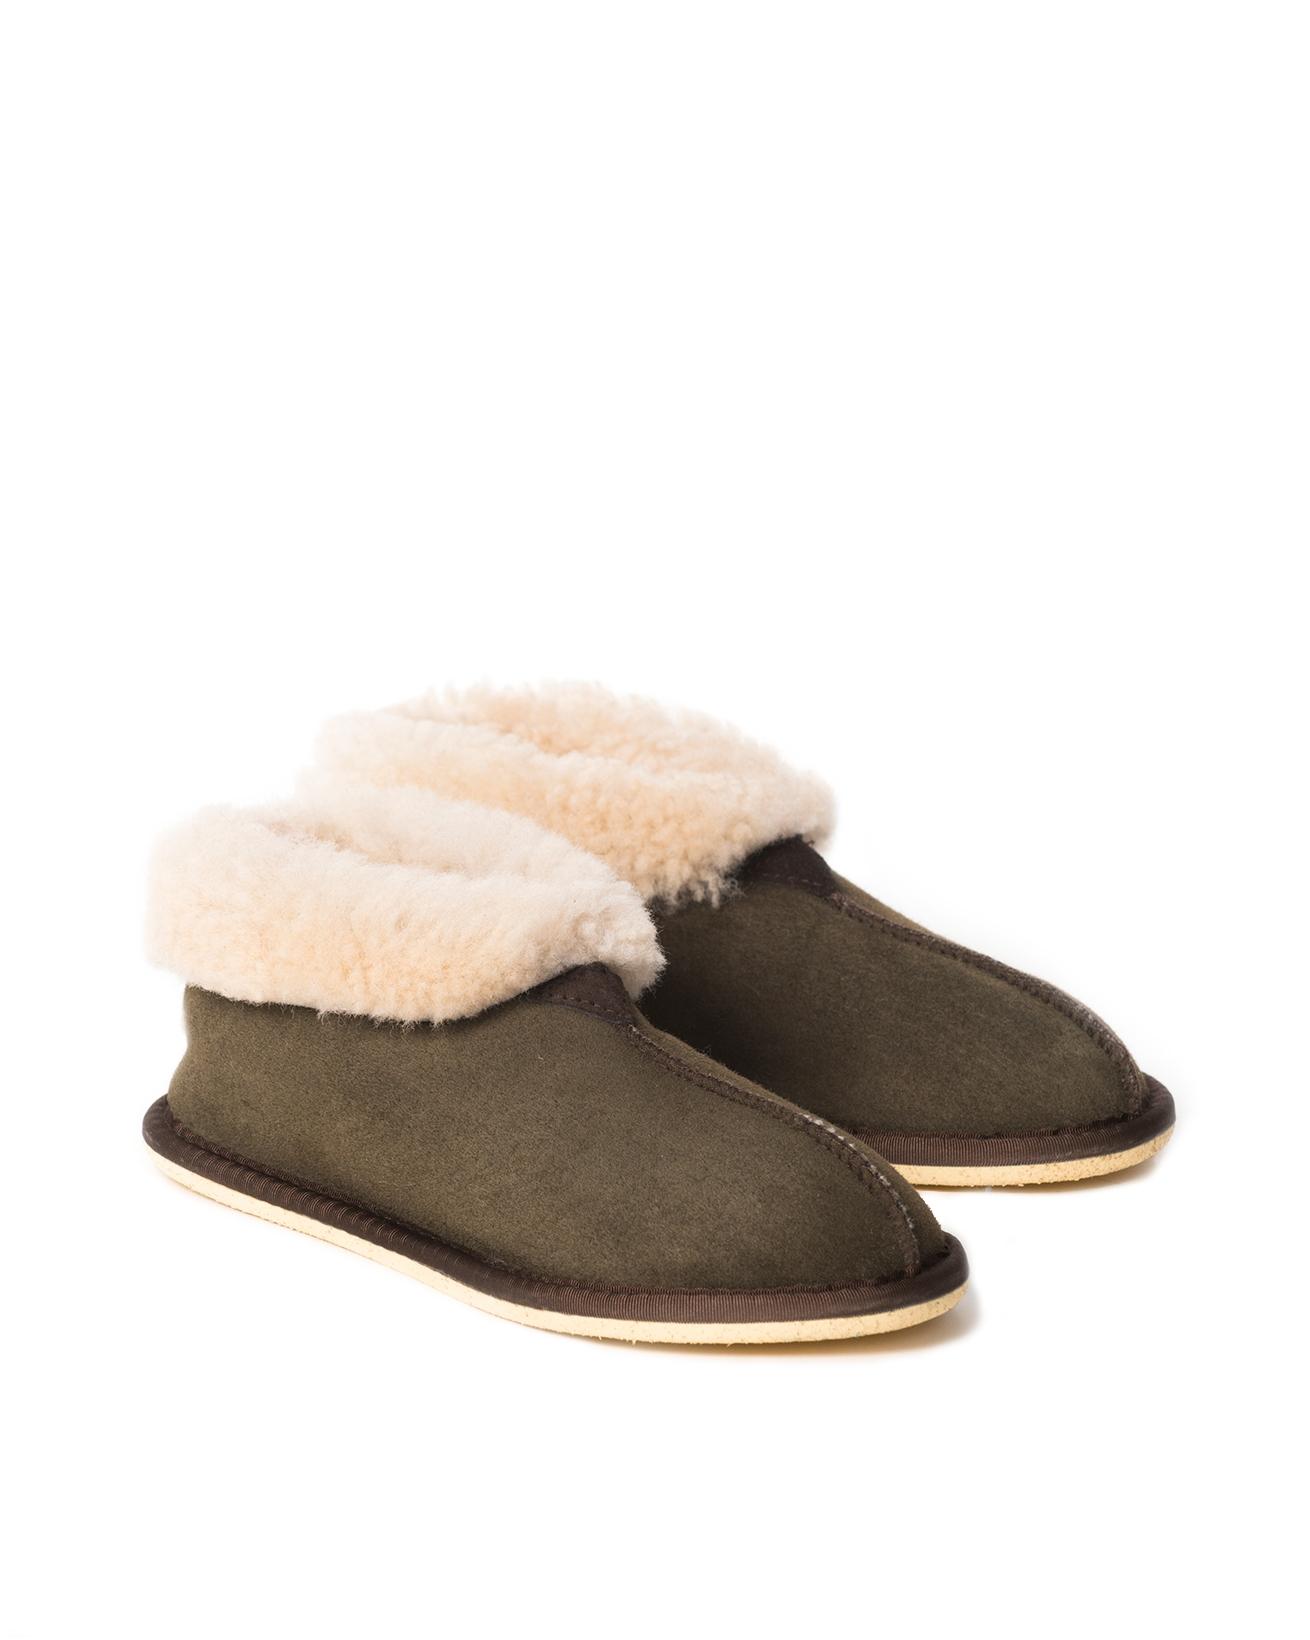 Ladies Sheepskin Bootee Slipper - Size 6 - Moorland - 2072